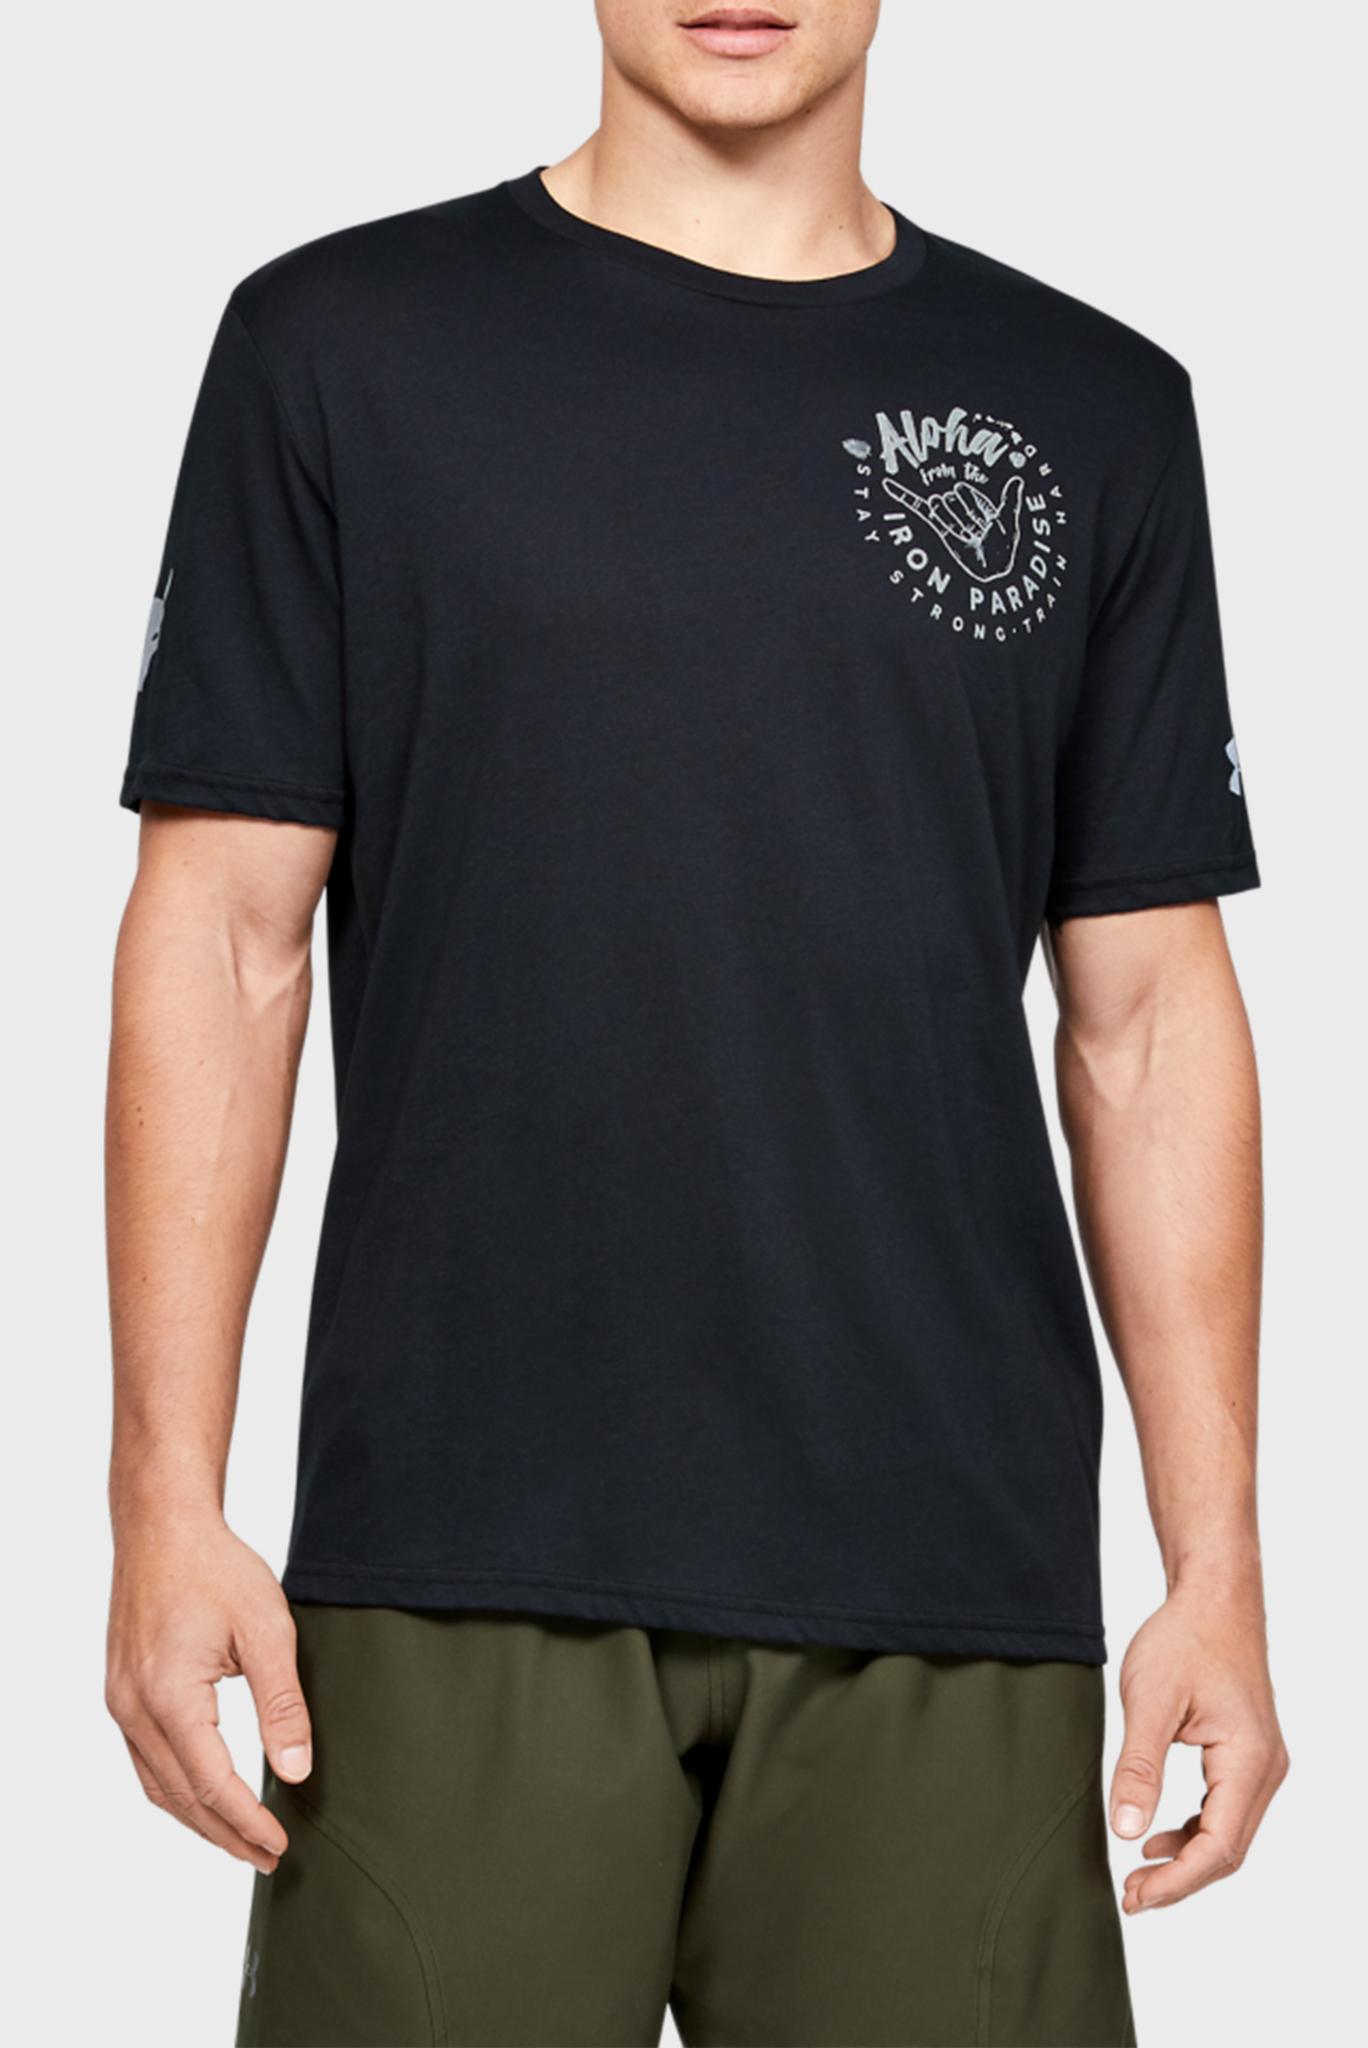 Мужская черная спортивная футболка Project Rock Iron Paradise SS Under Armour